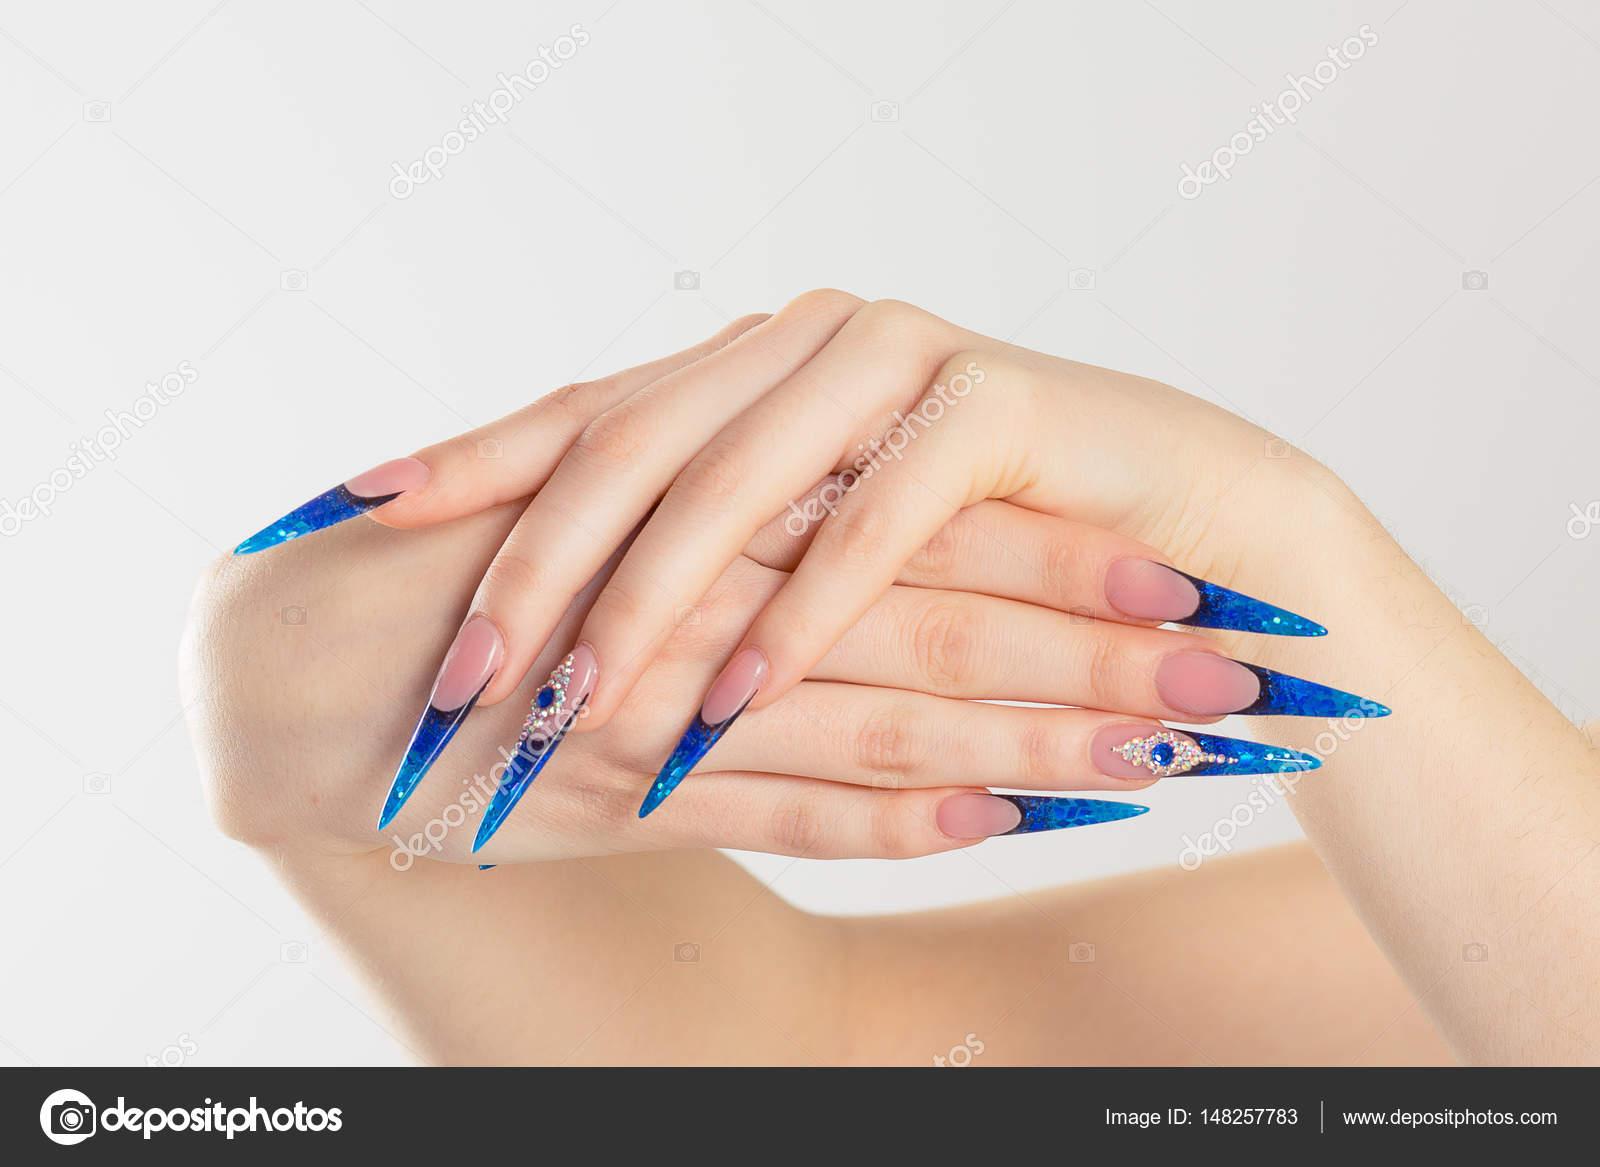 de uñas. Arte manicura. Estilo moderno azul de esmalte de uñas ...